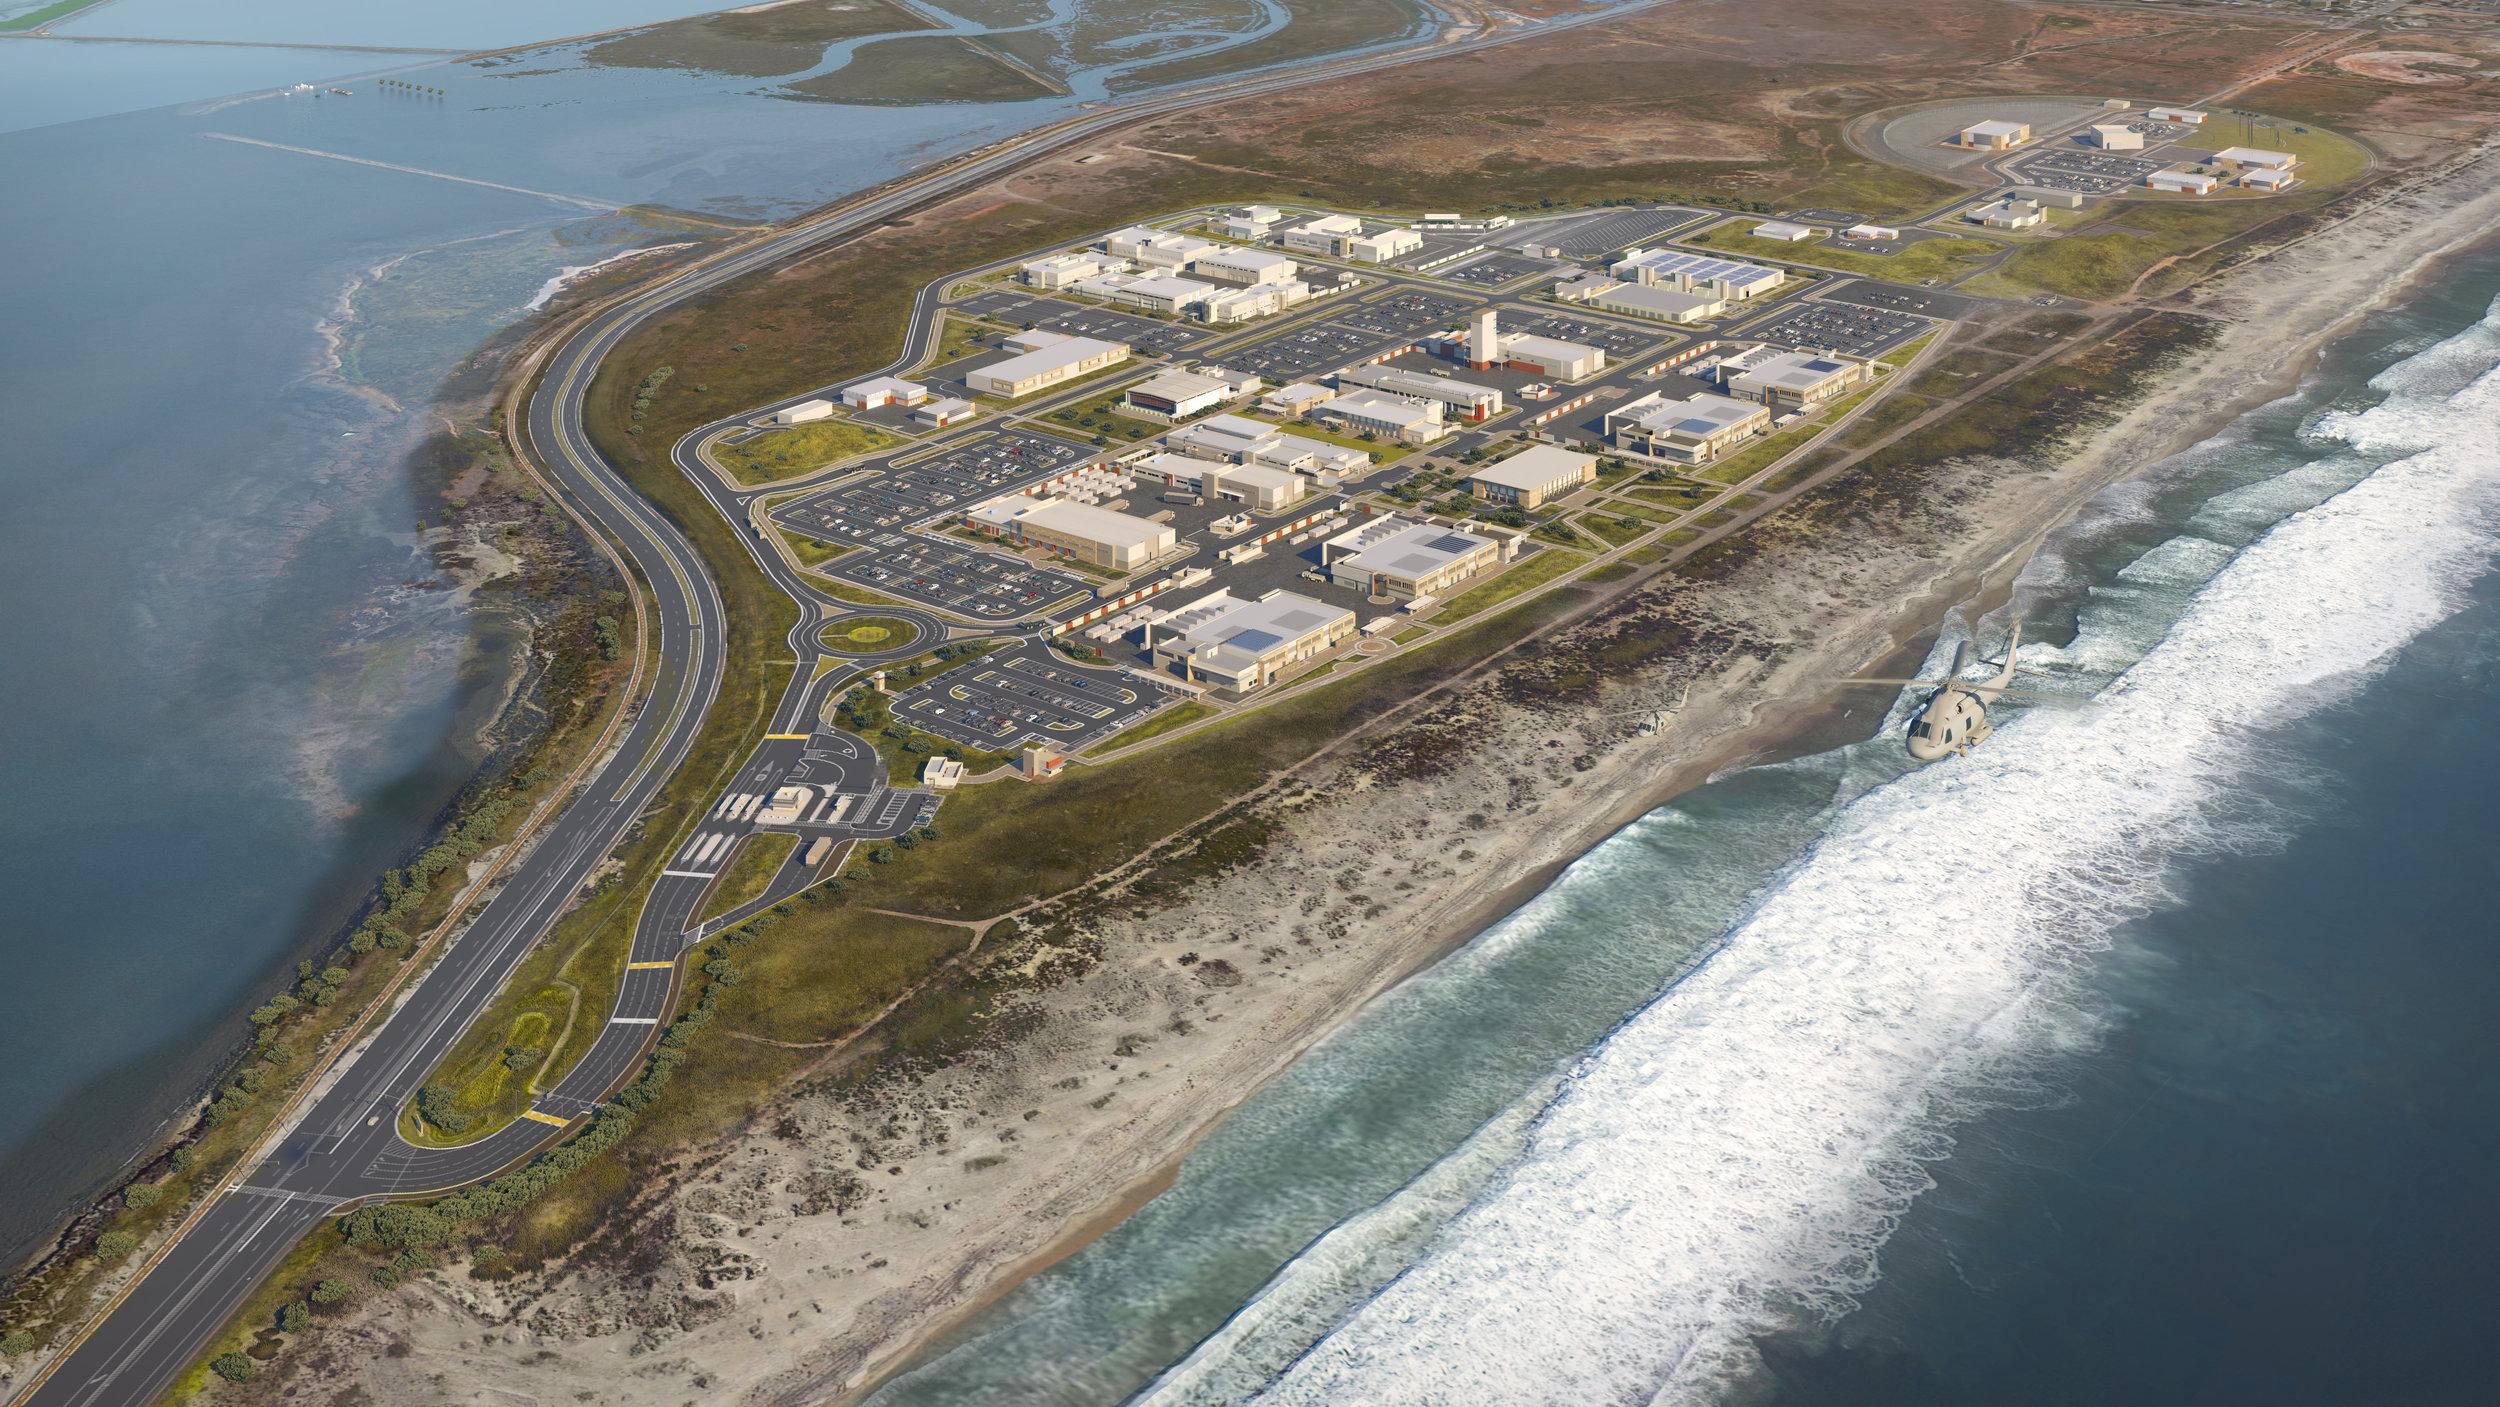 coastal campus aerial 11_28_2017.jpg